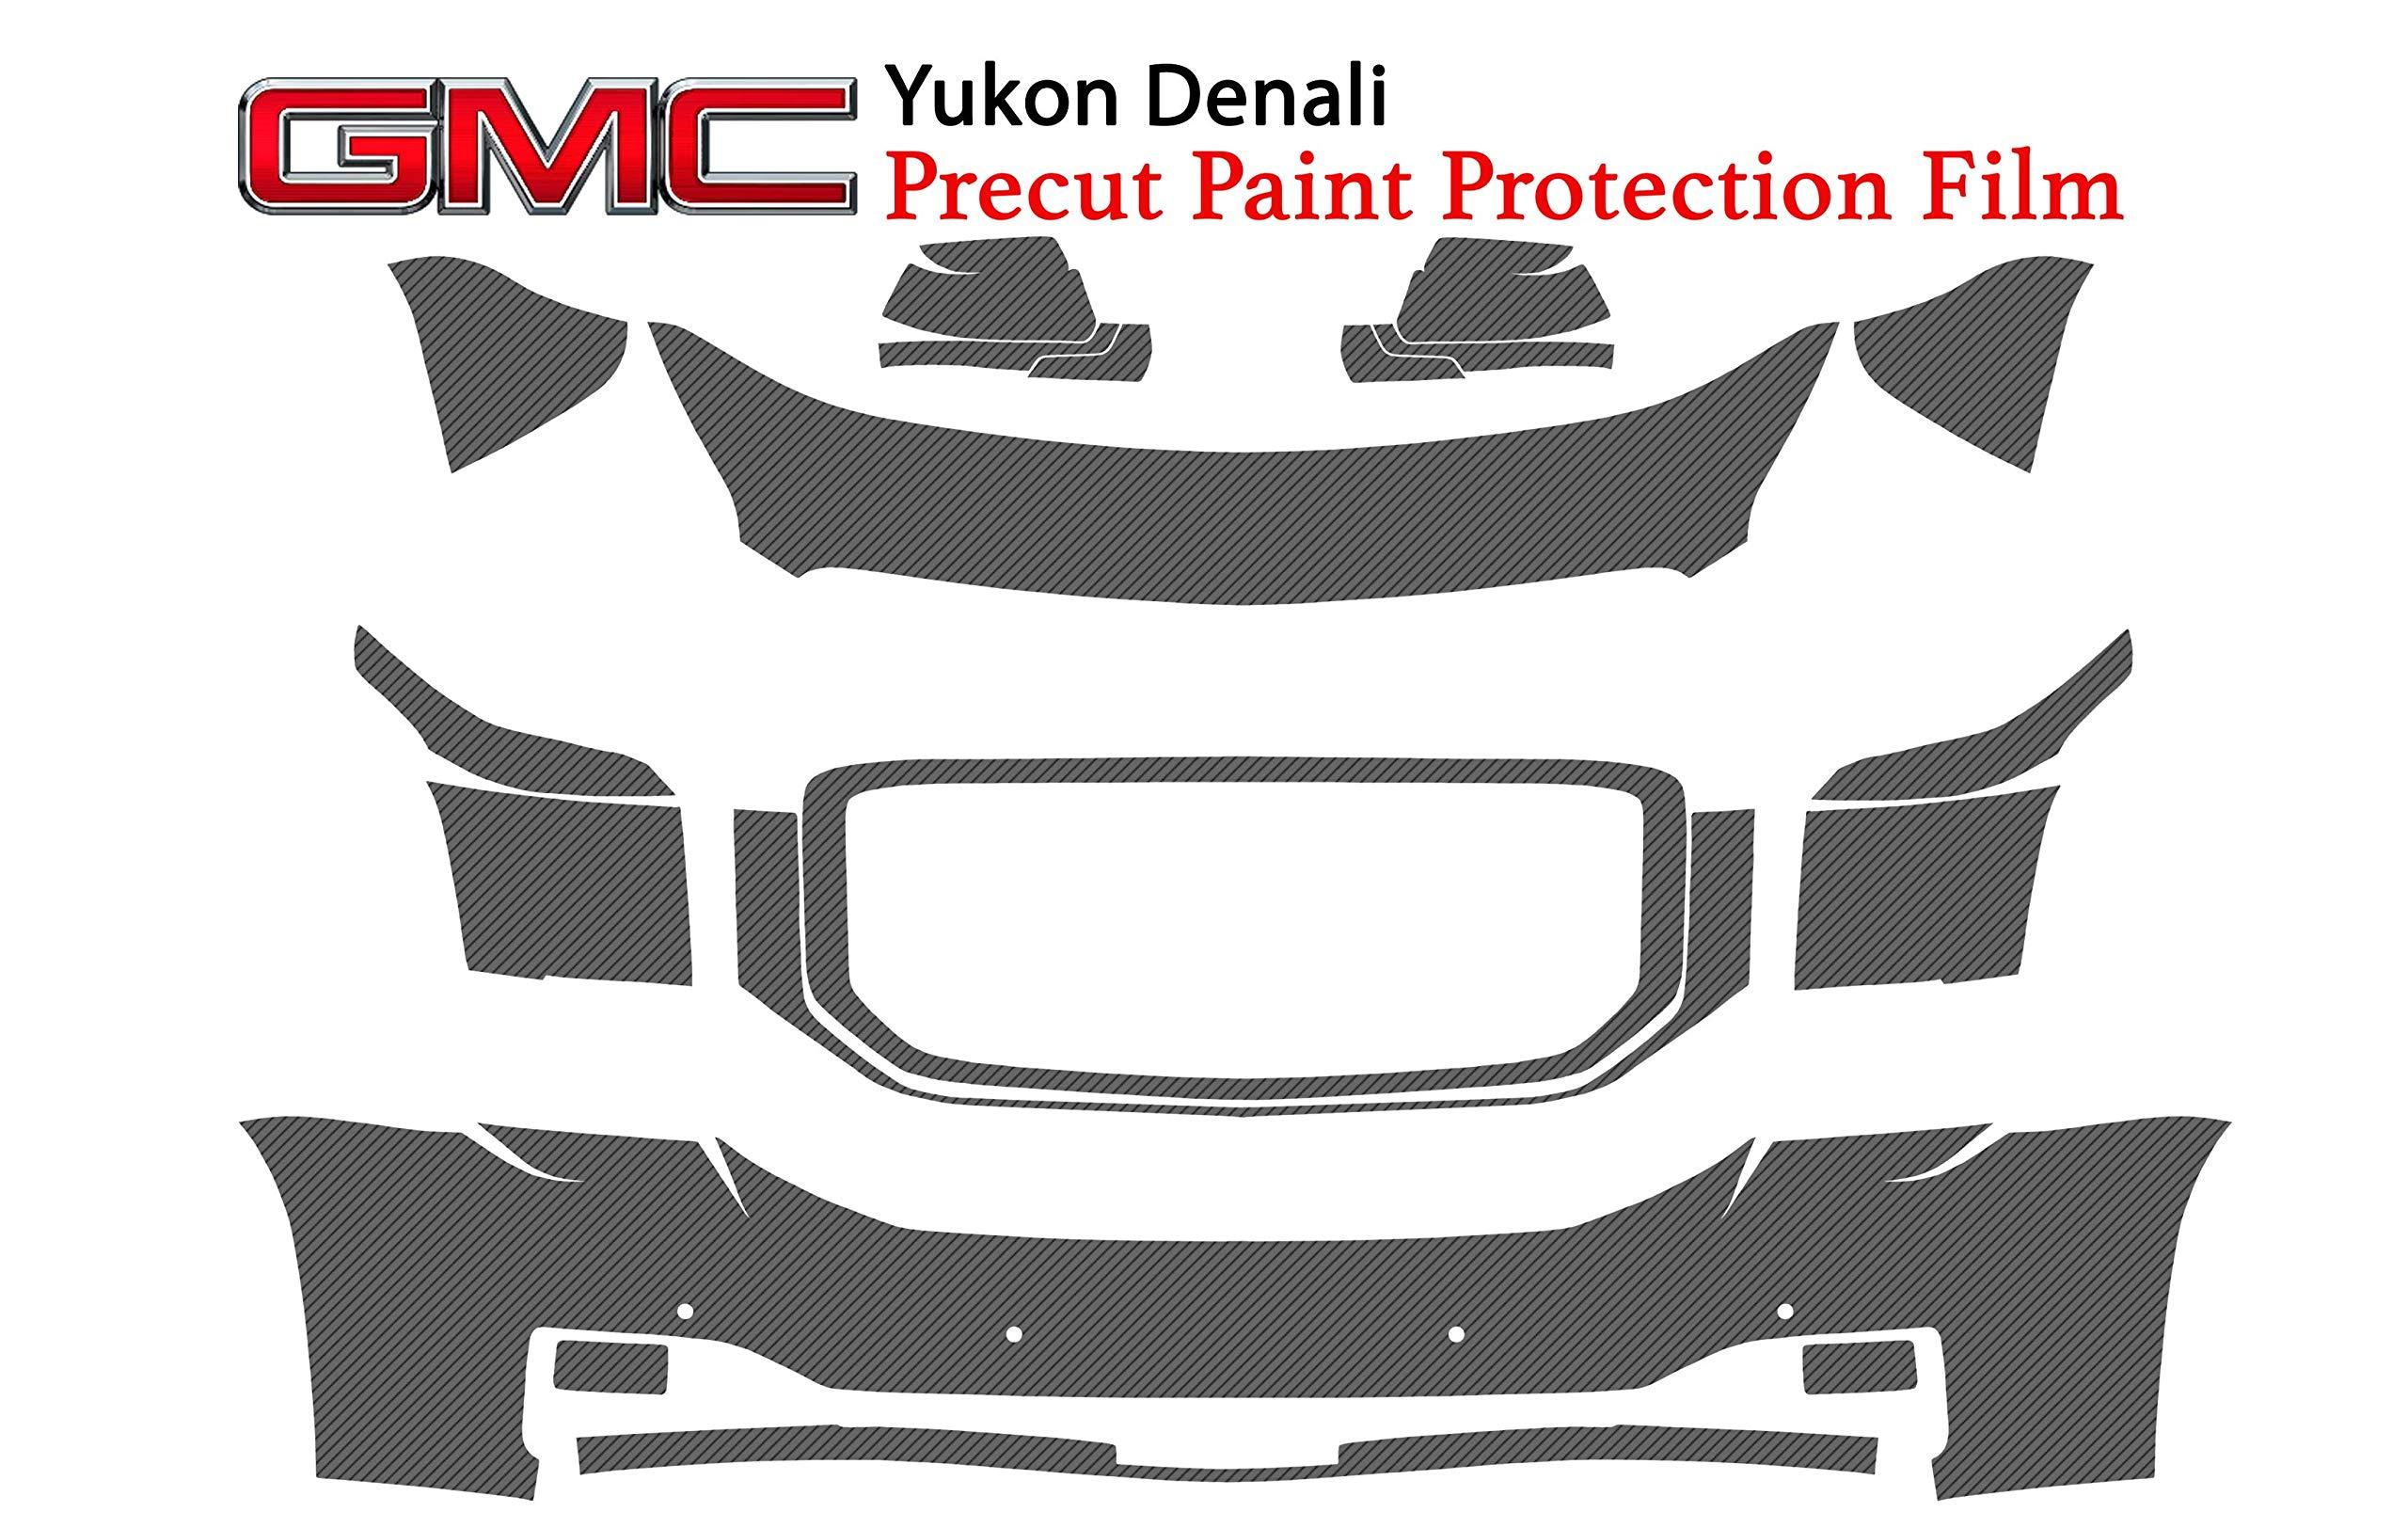 The Online Liquidator Full Front Protective Film GMC Yukon Denali 2015-2018 - Clear Bra Professional Car Paint Shield Cover